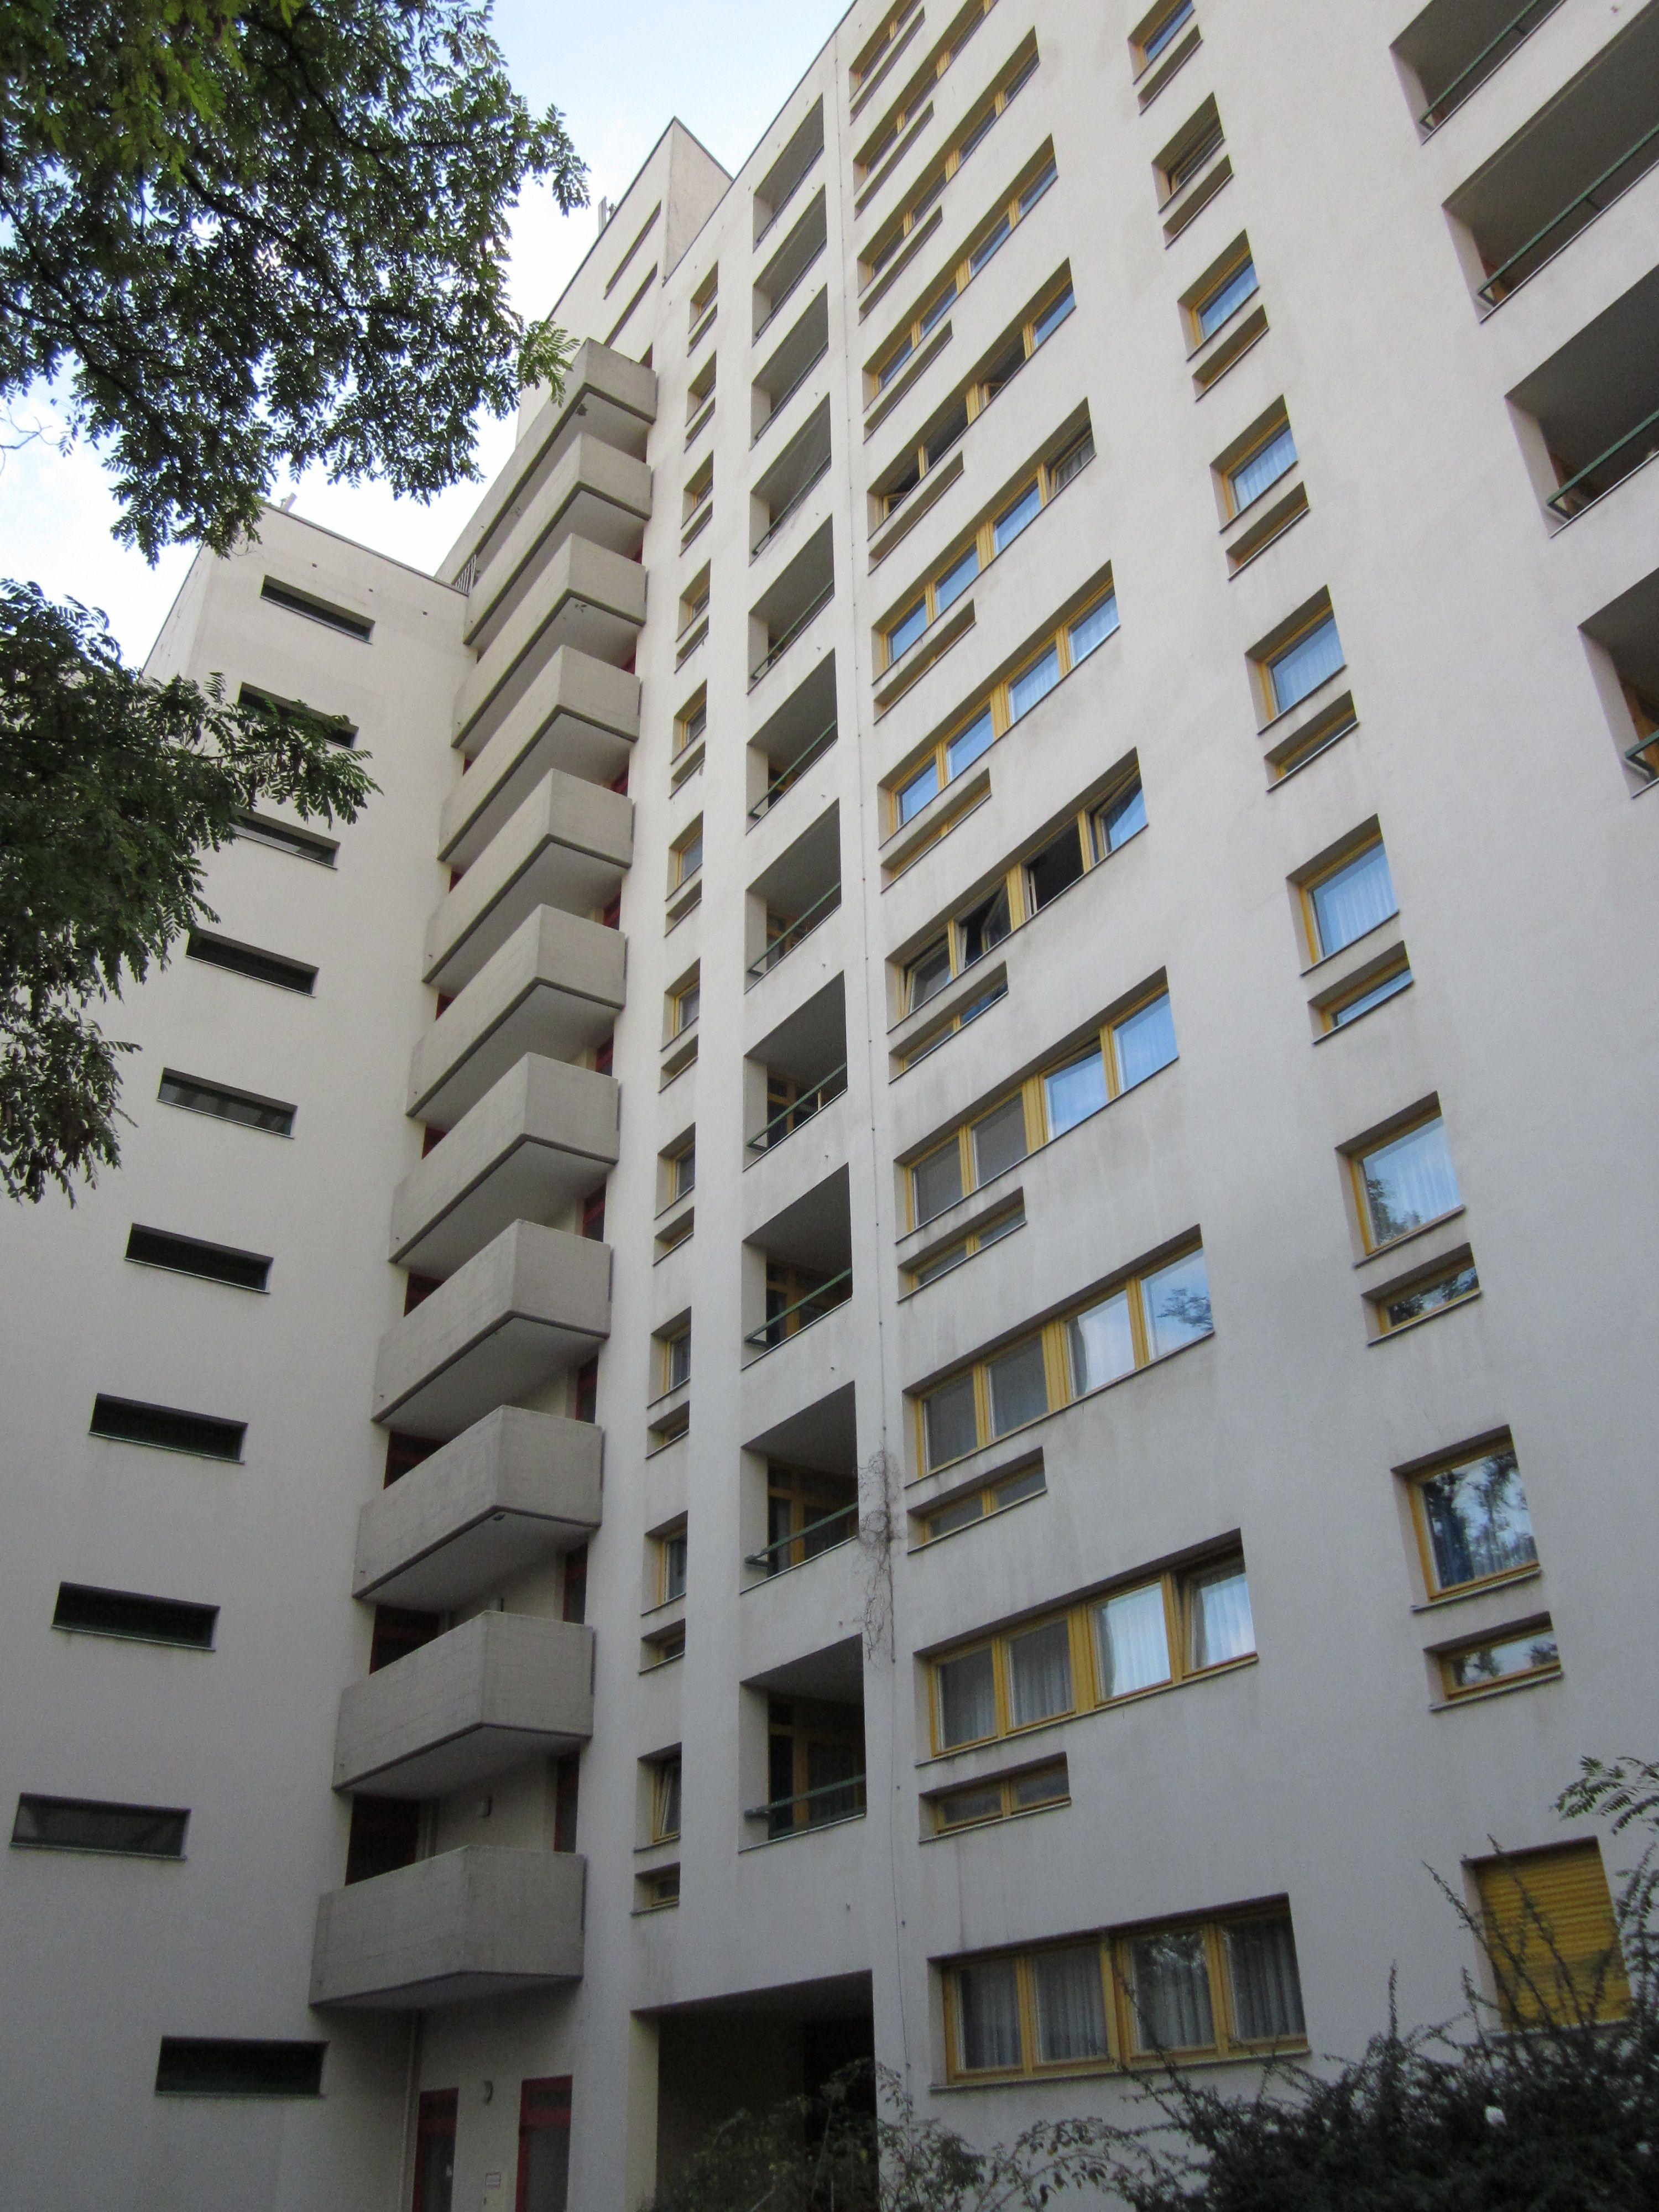 Bauhaus Charlottenburg pin by jannet hill on berlin bauhaus architecture